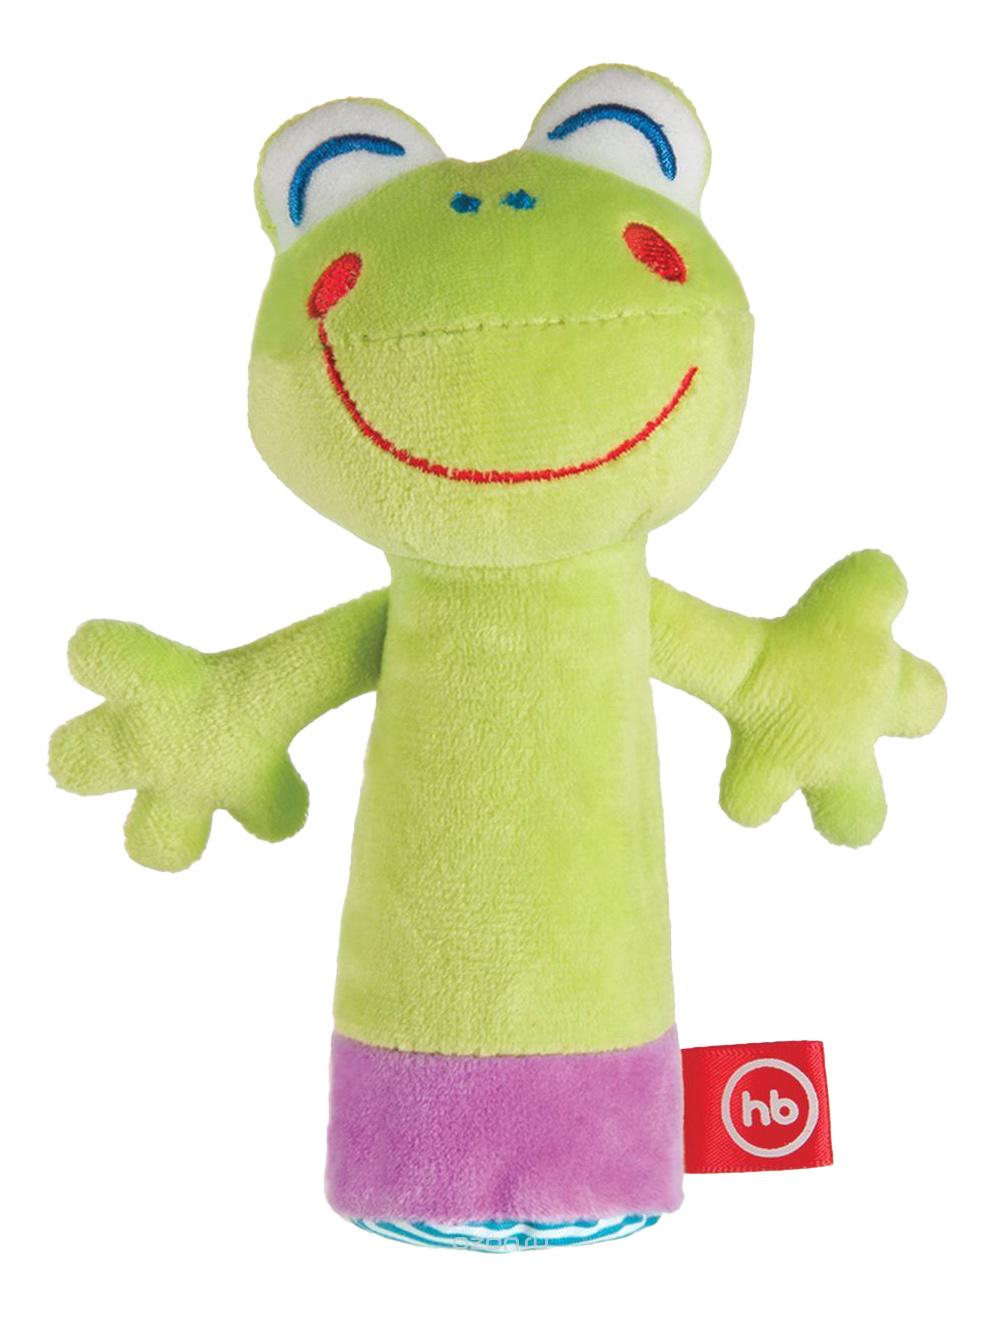 Мягкая развивающая игрушка Cheepy Frogling Happy Baby